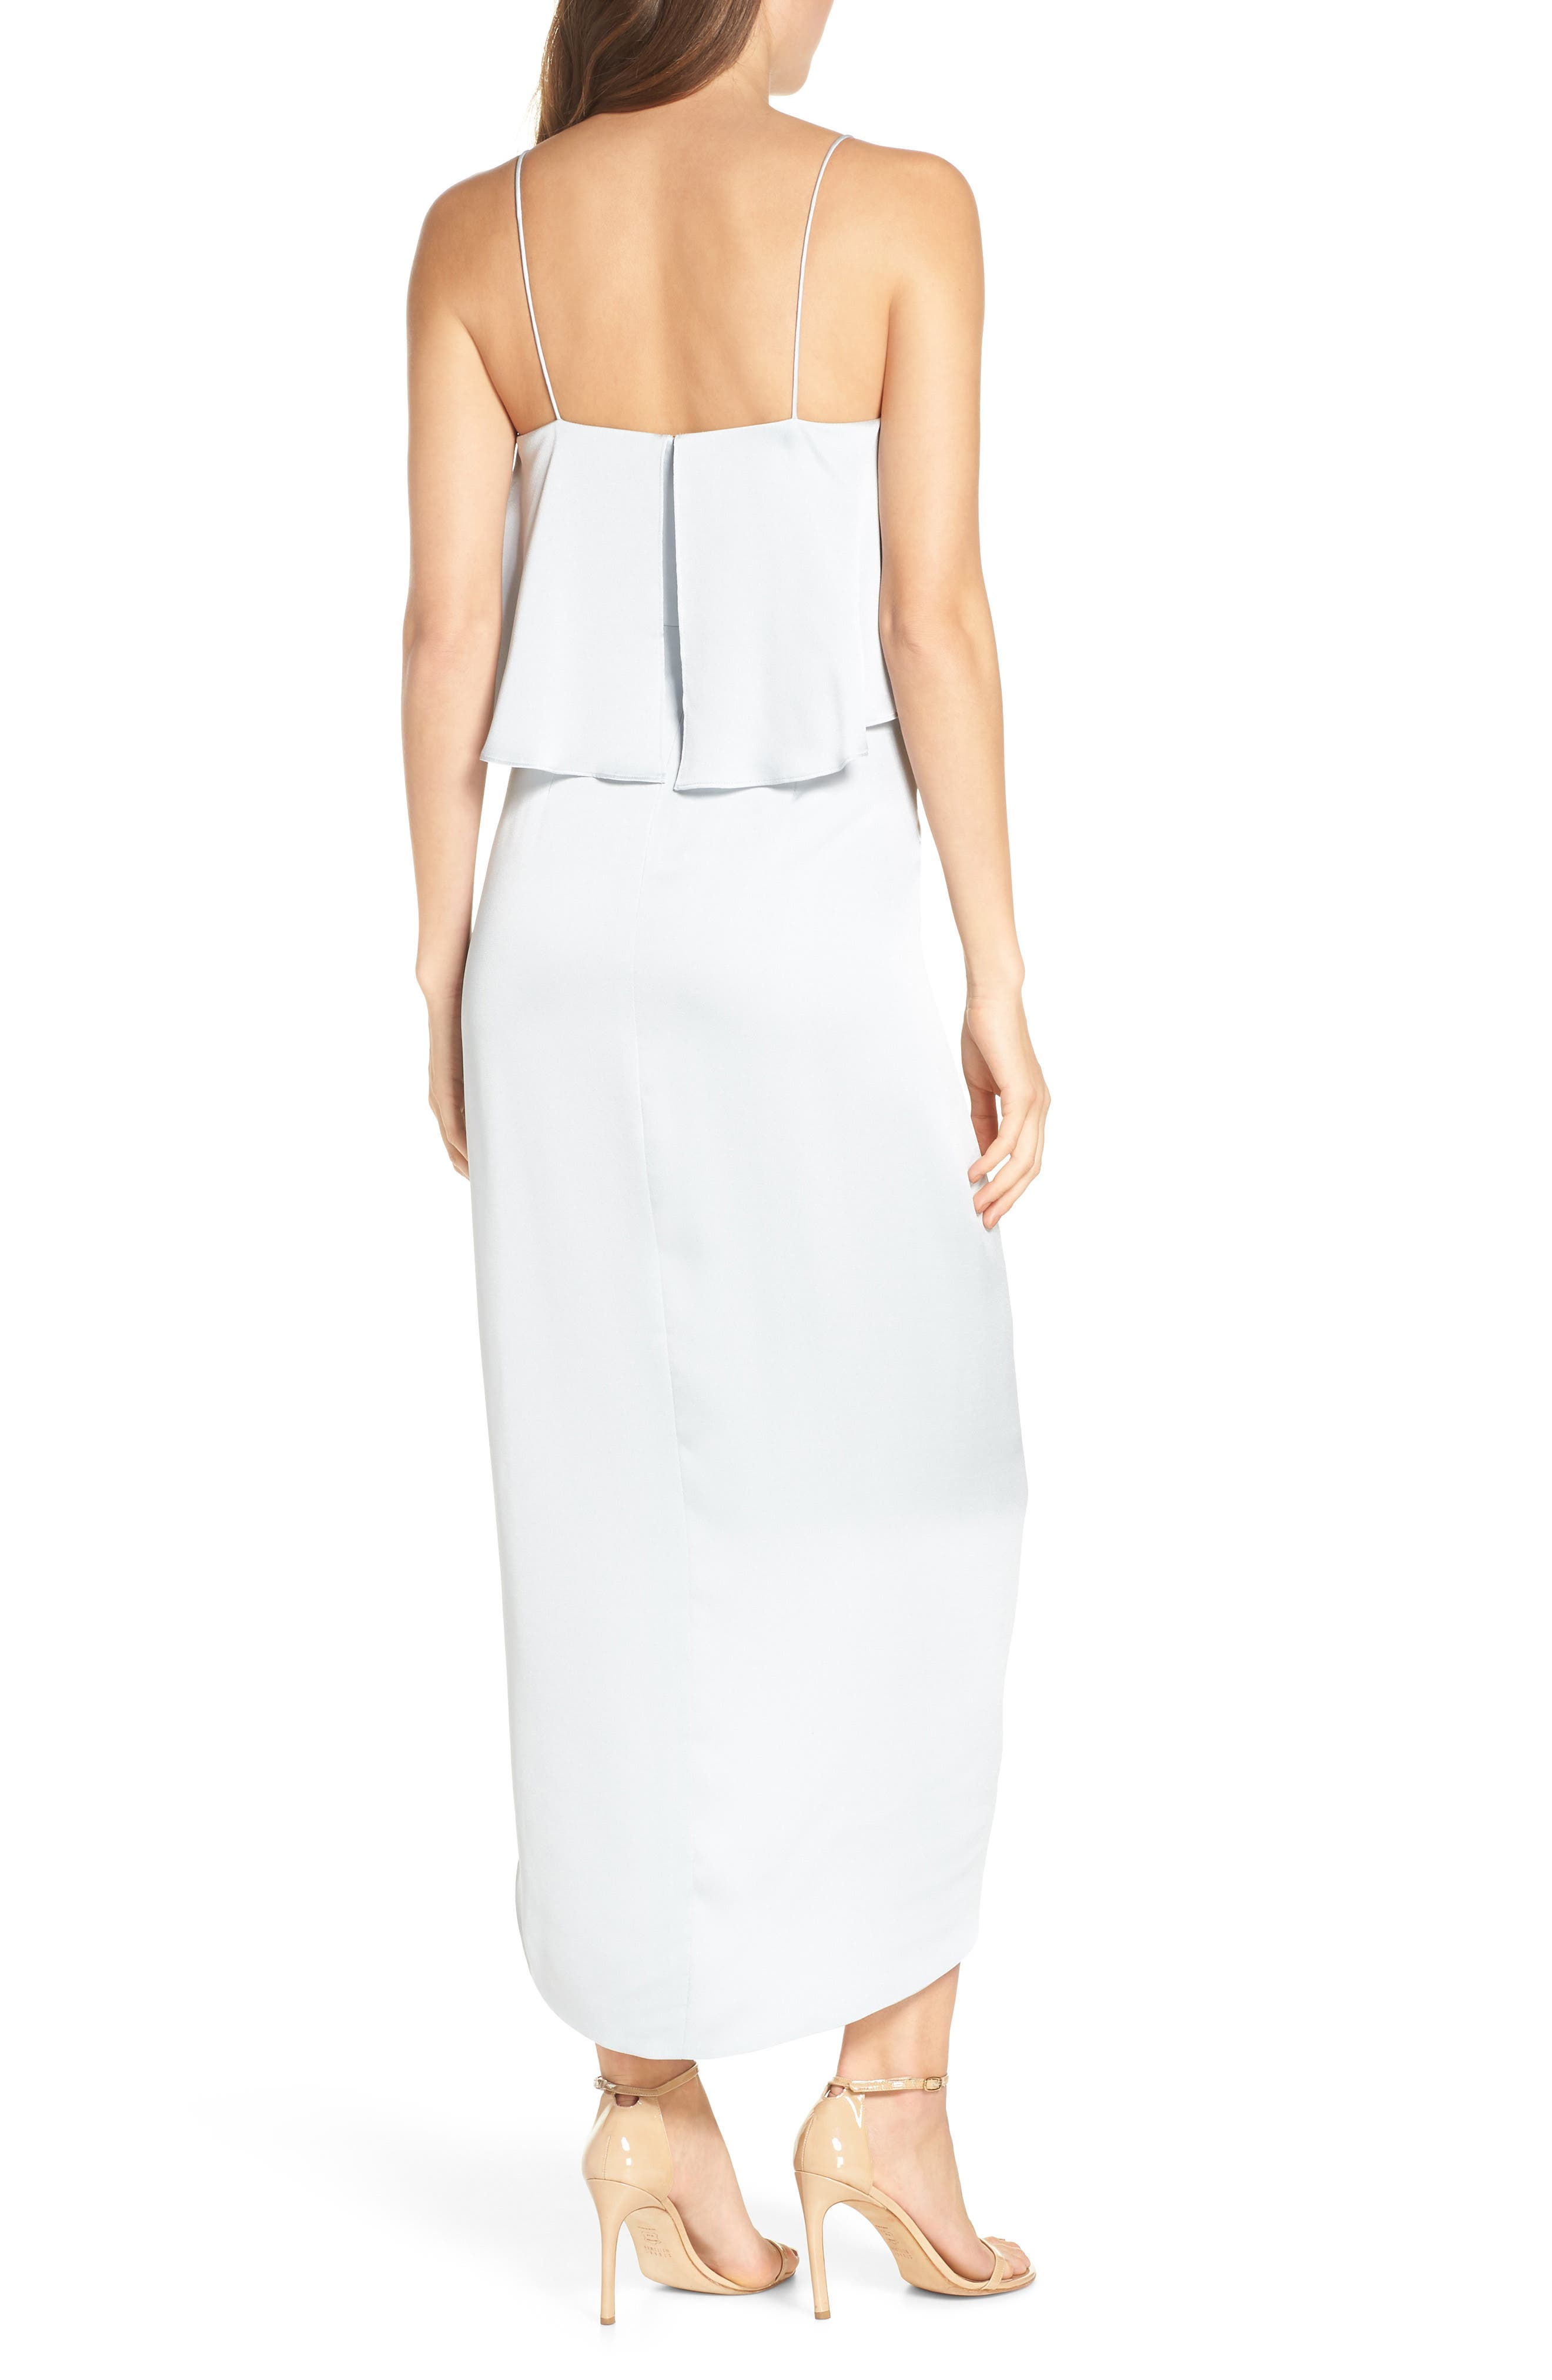 SHONA JOY, Luxe Frill Tulip Hem Maxi Dress, Alternate thumbnail 2, color, CLOUD